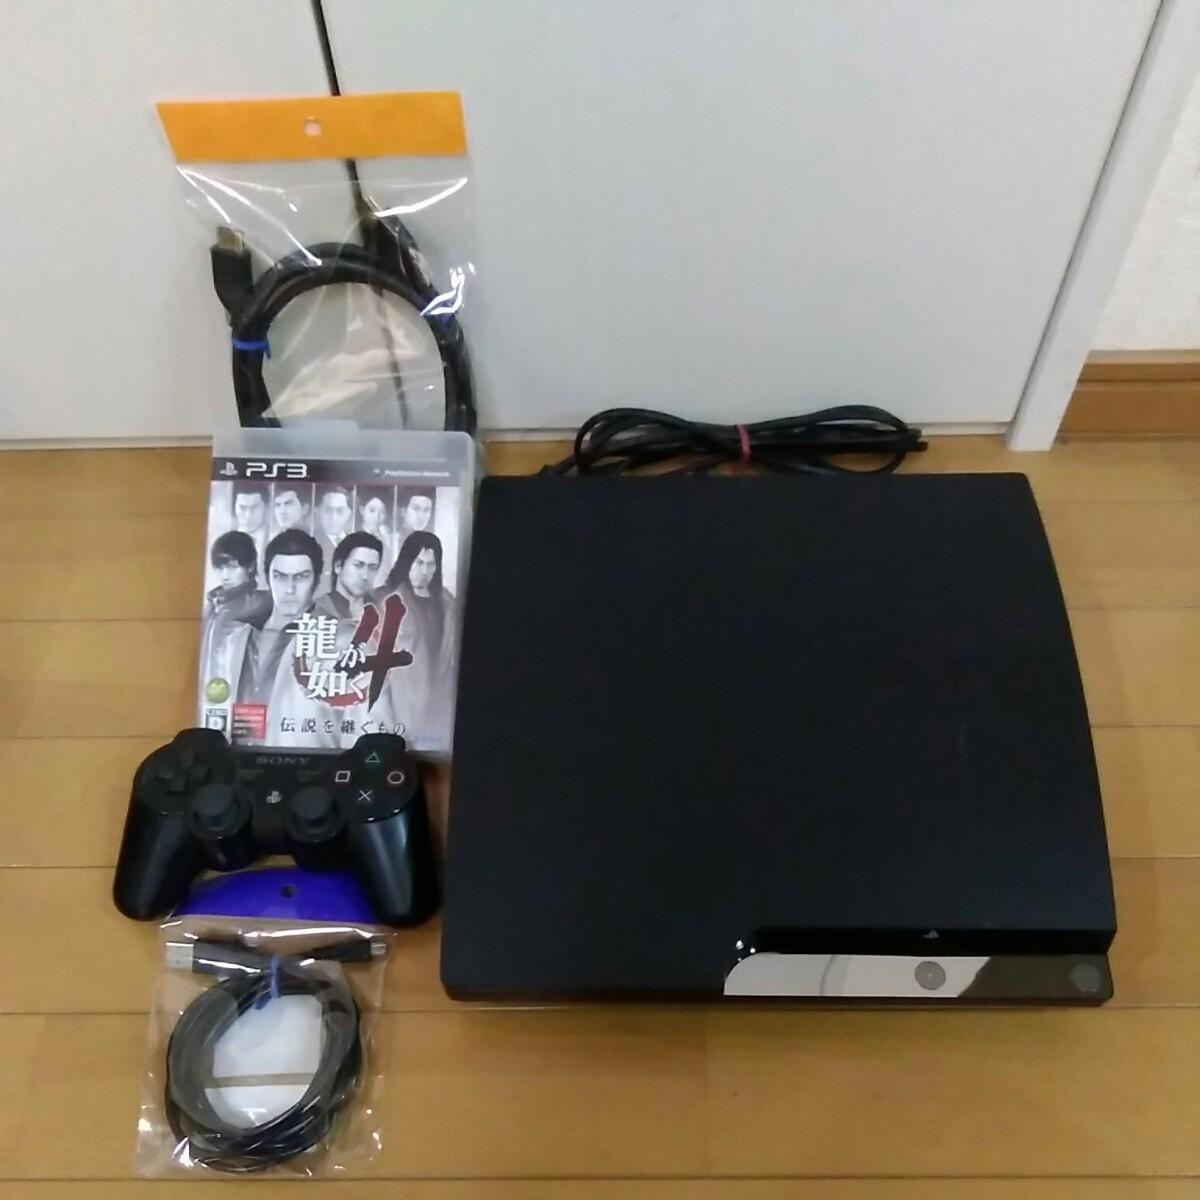 SSD 交換済 PS3 2500番台 ワイヤレスコントローラー付